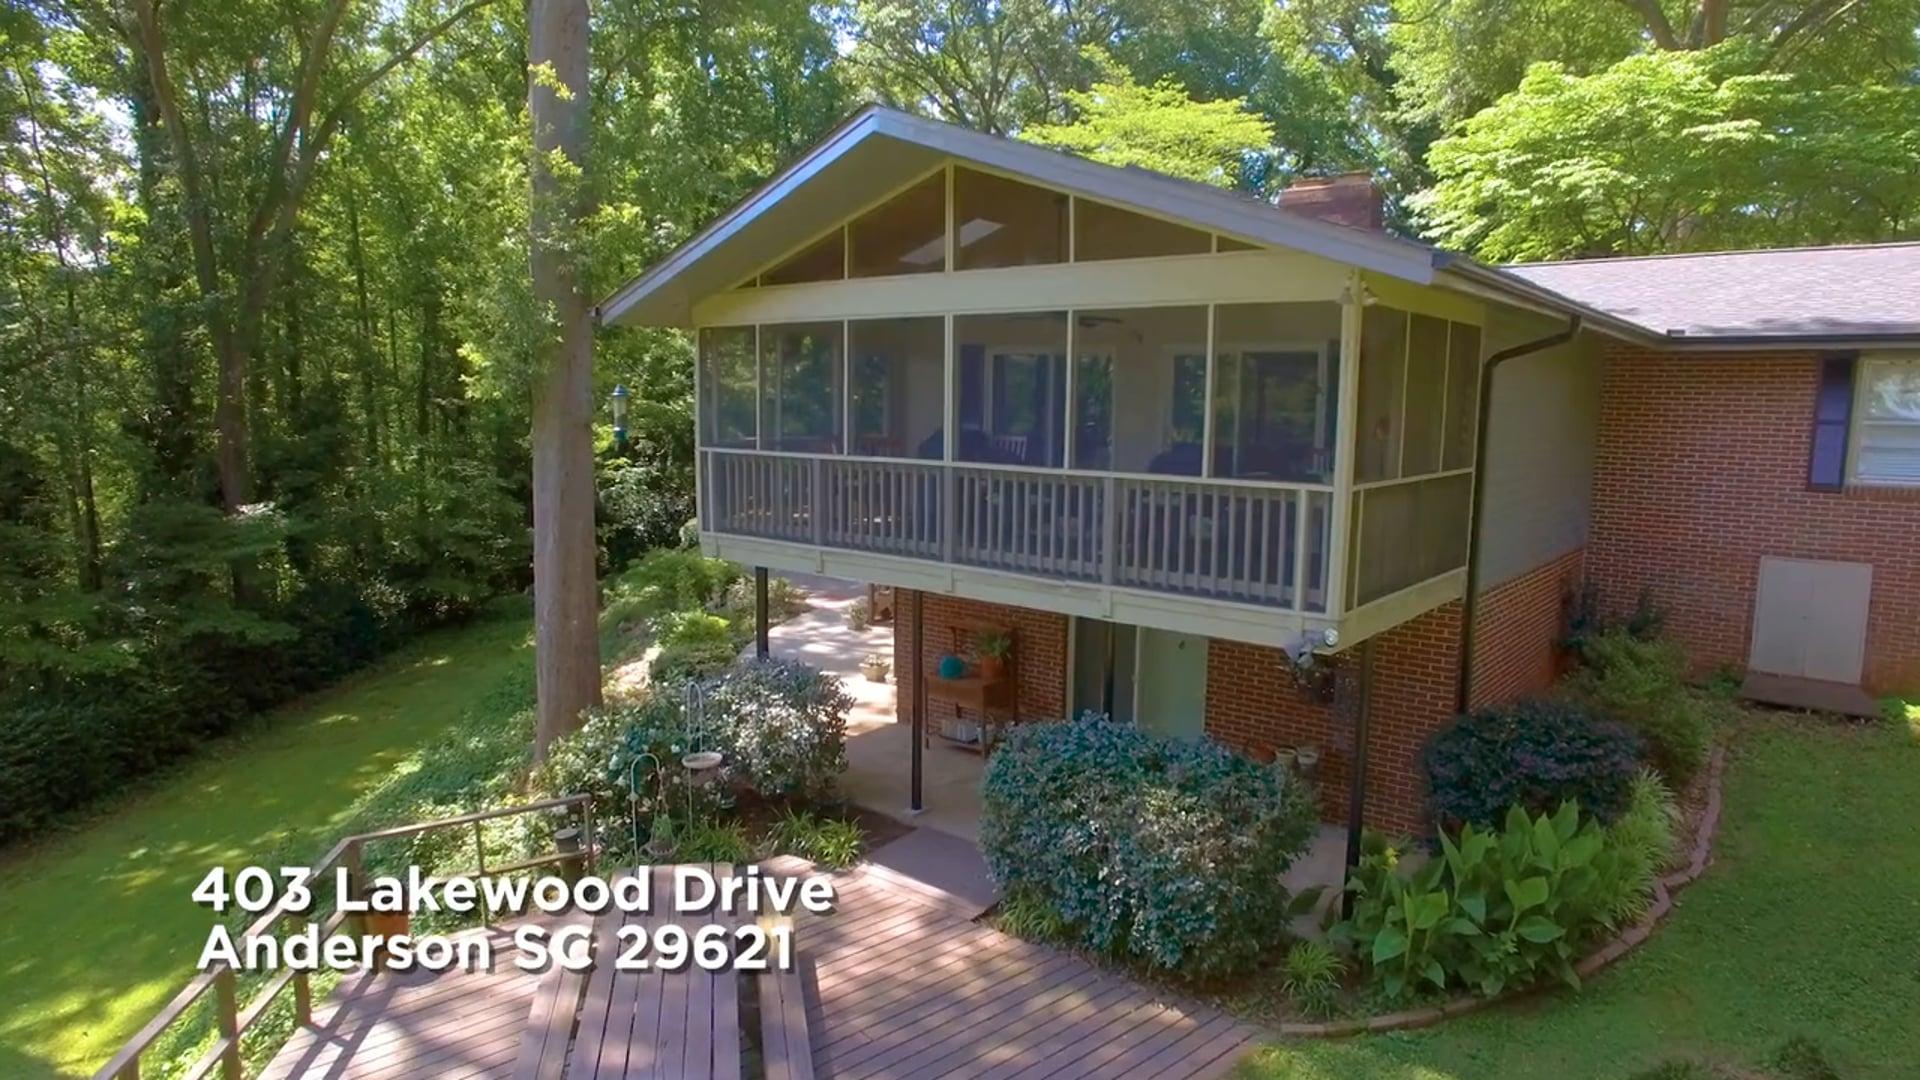 403 Lakewood Drive Anderson SC 29621